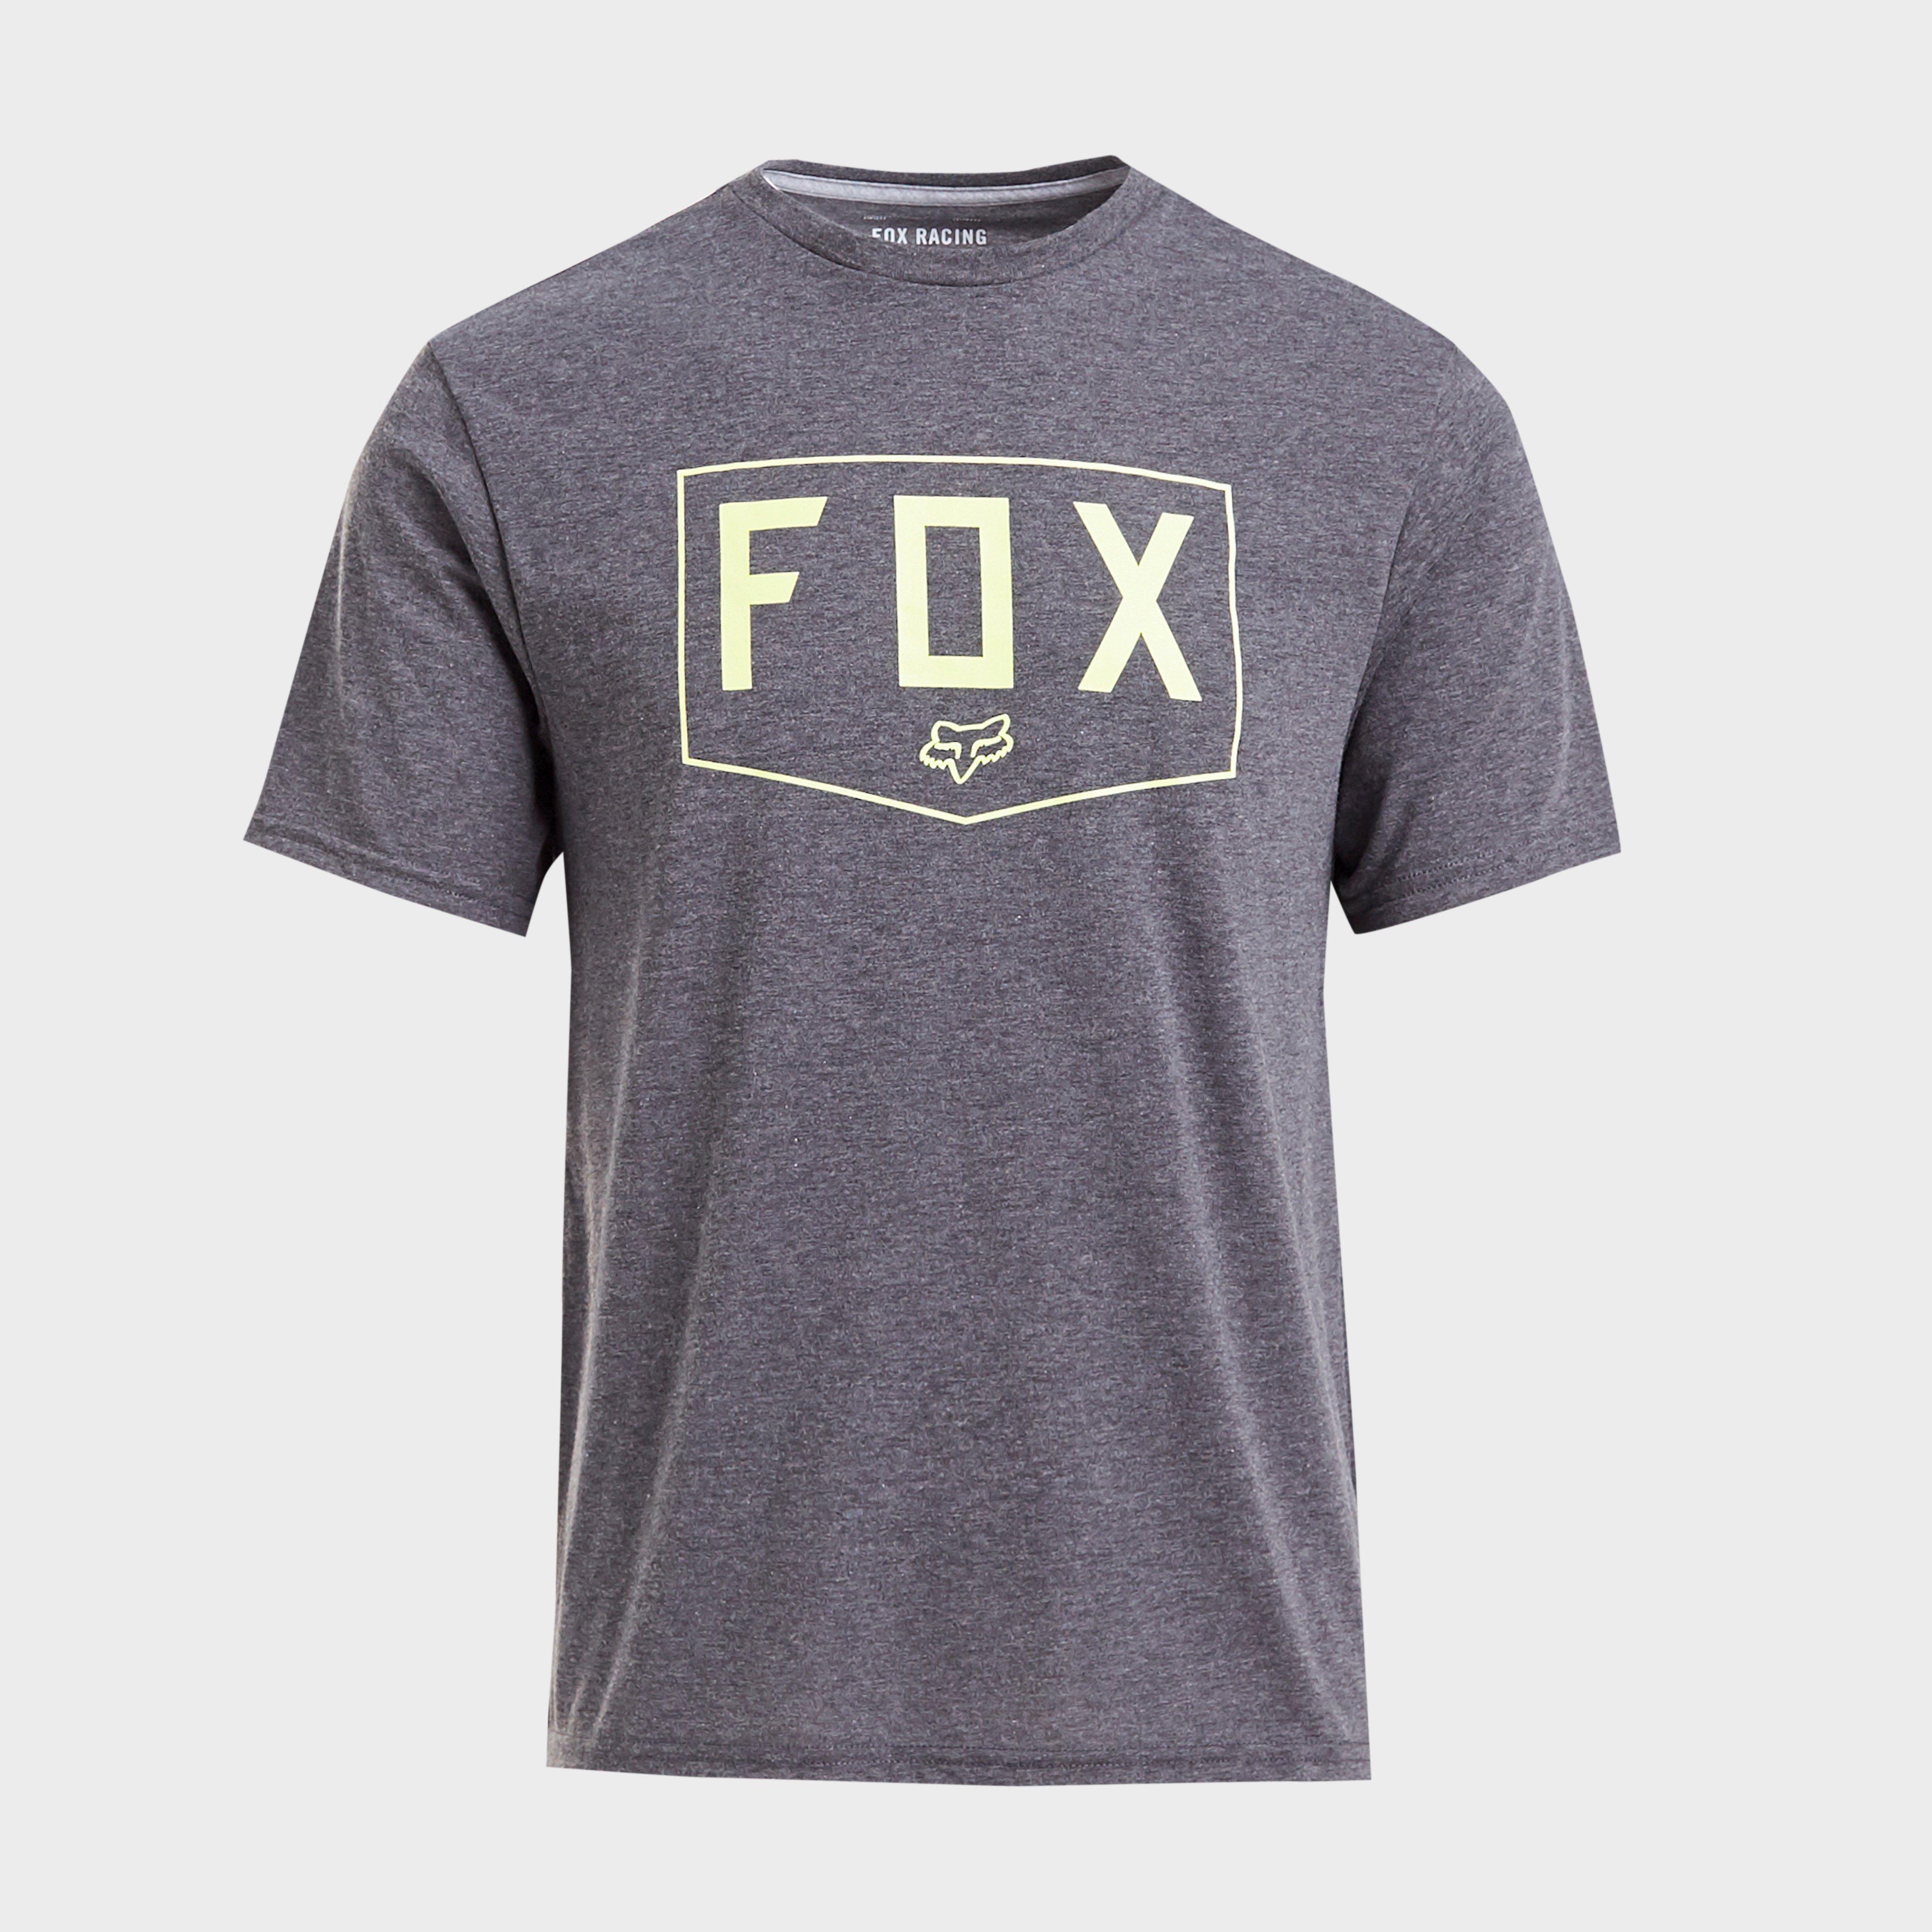 FOX Fox Shield Short Sleeve Tech Tee, Grey